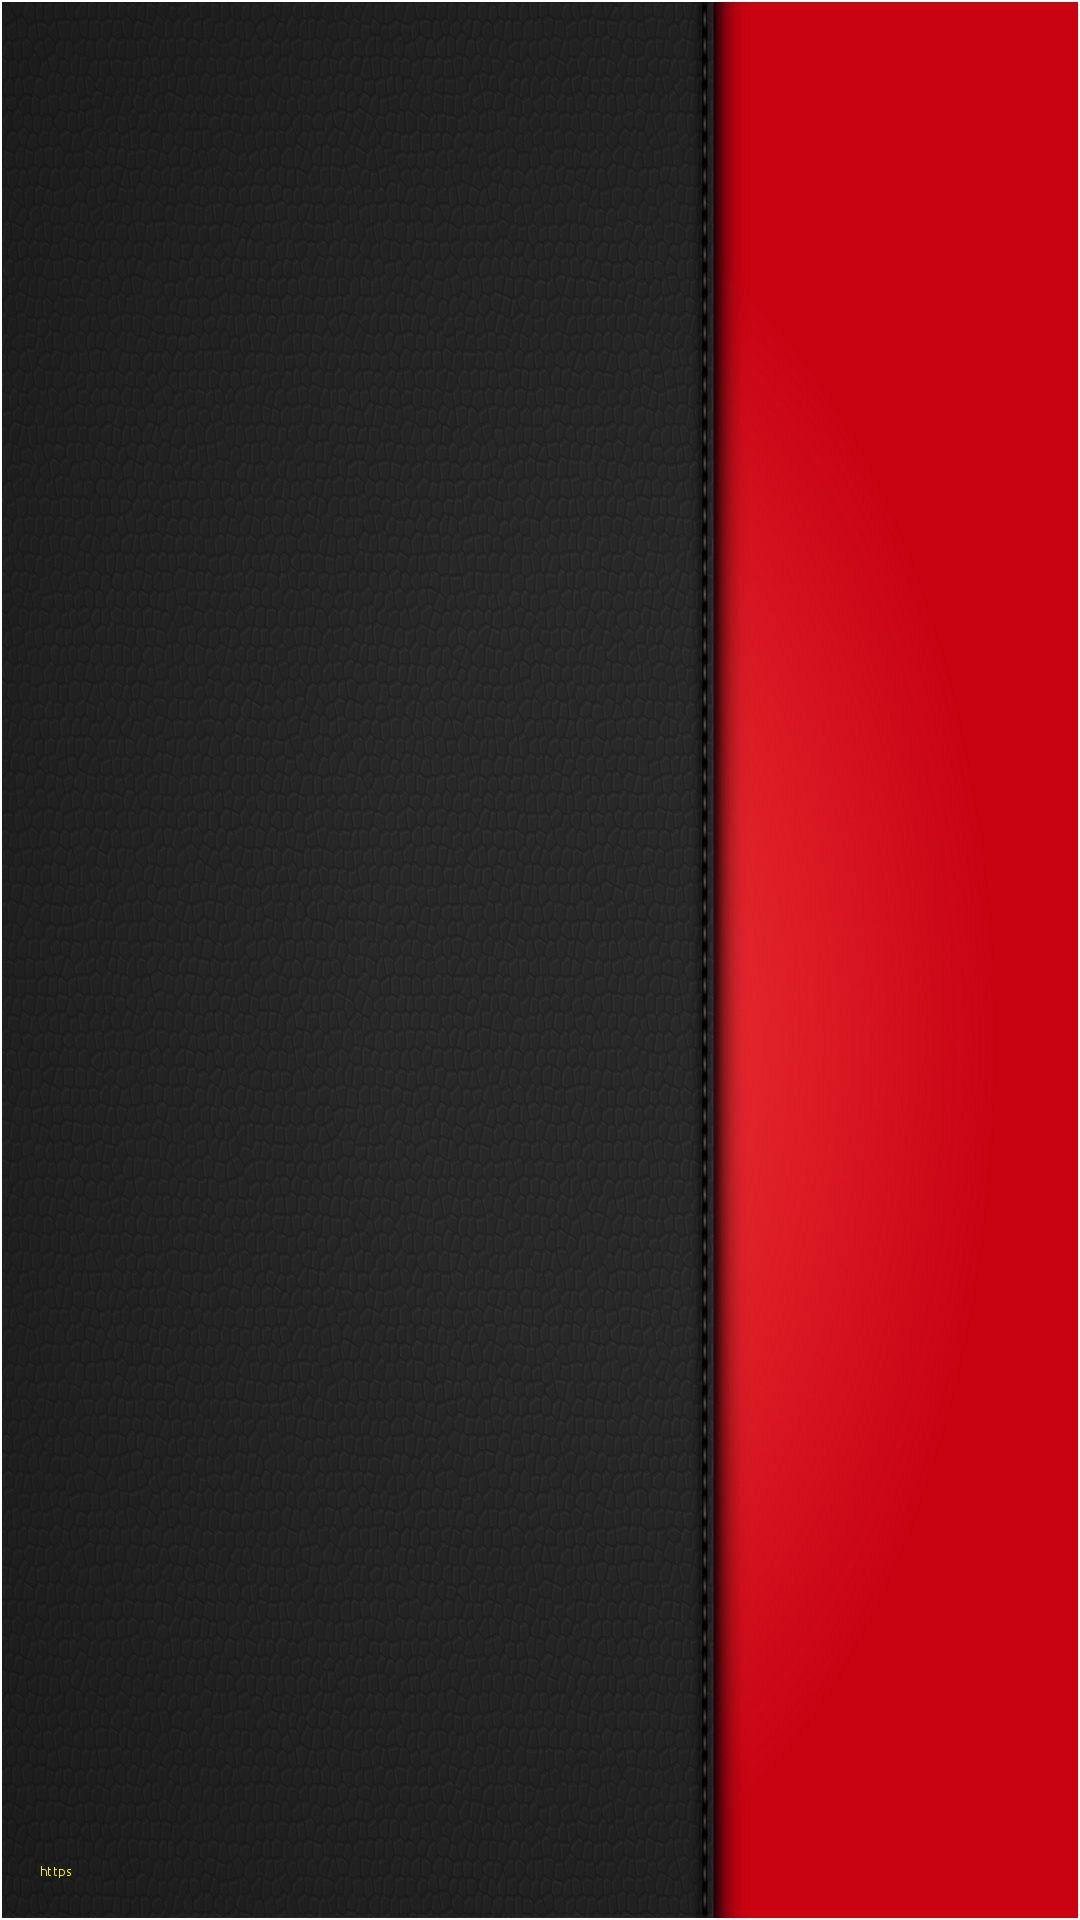 Black Red iPhone wallpaper